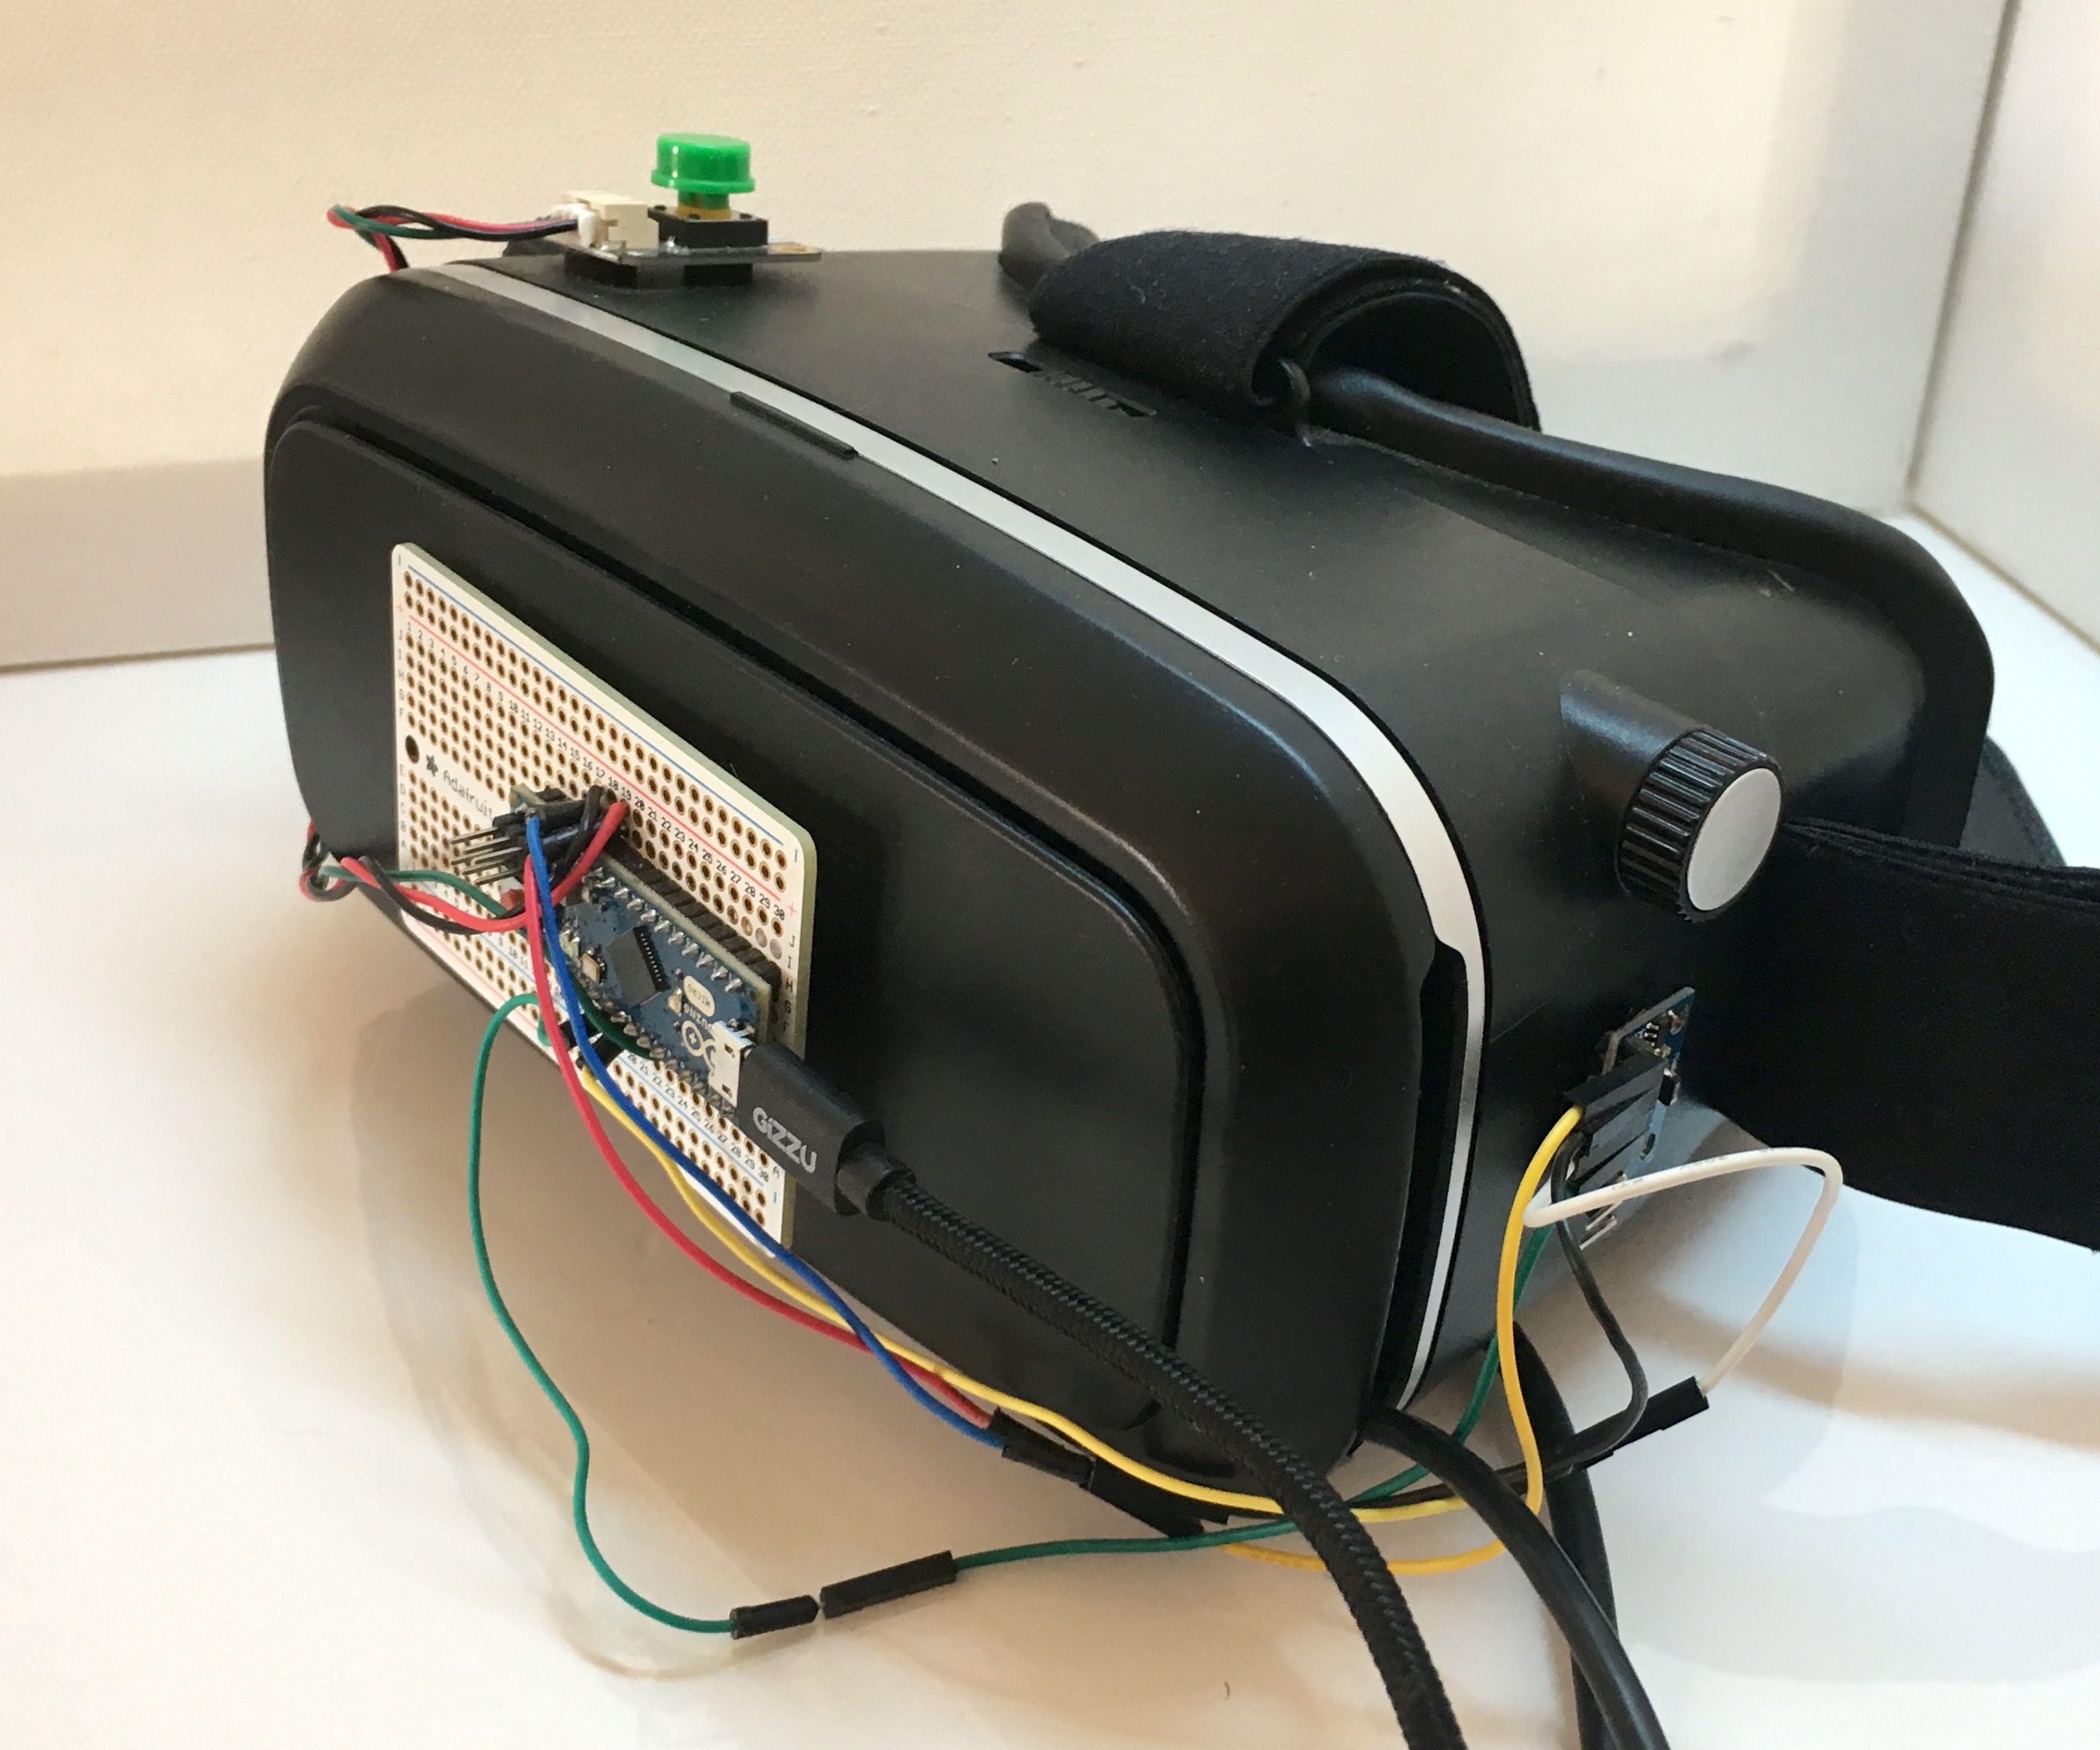 DIY VR HEADSET FOR $80